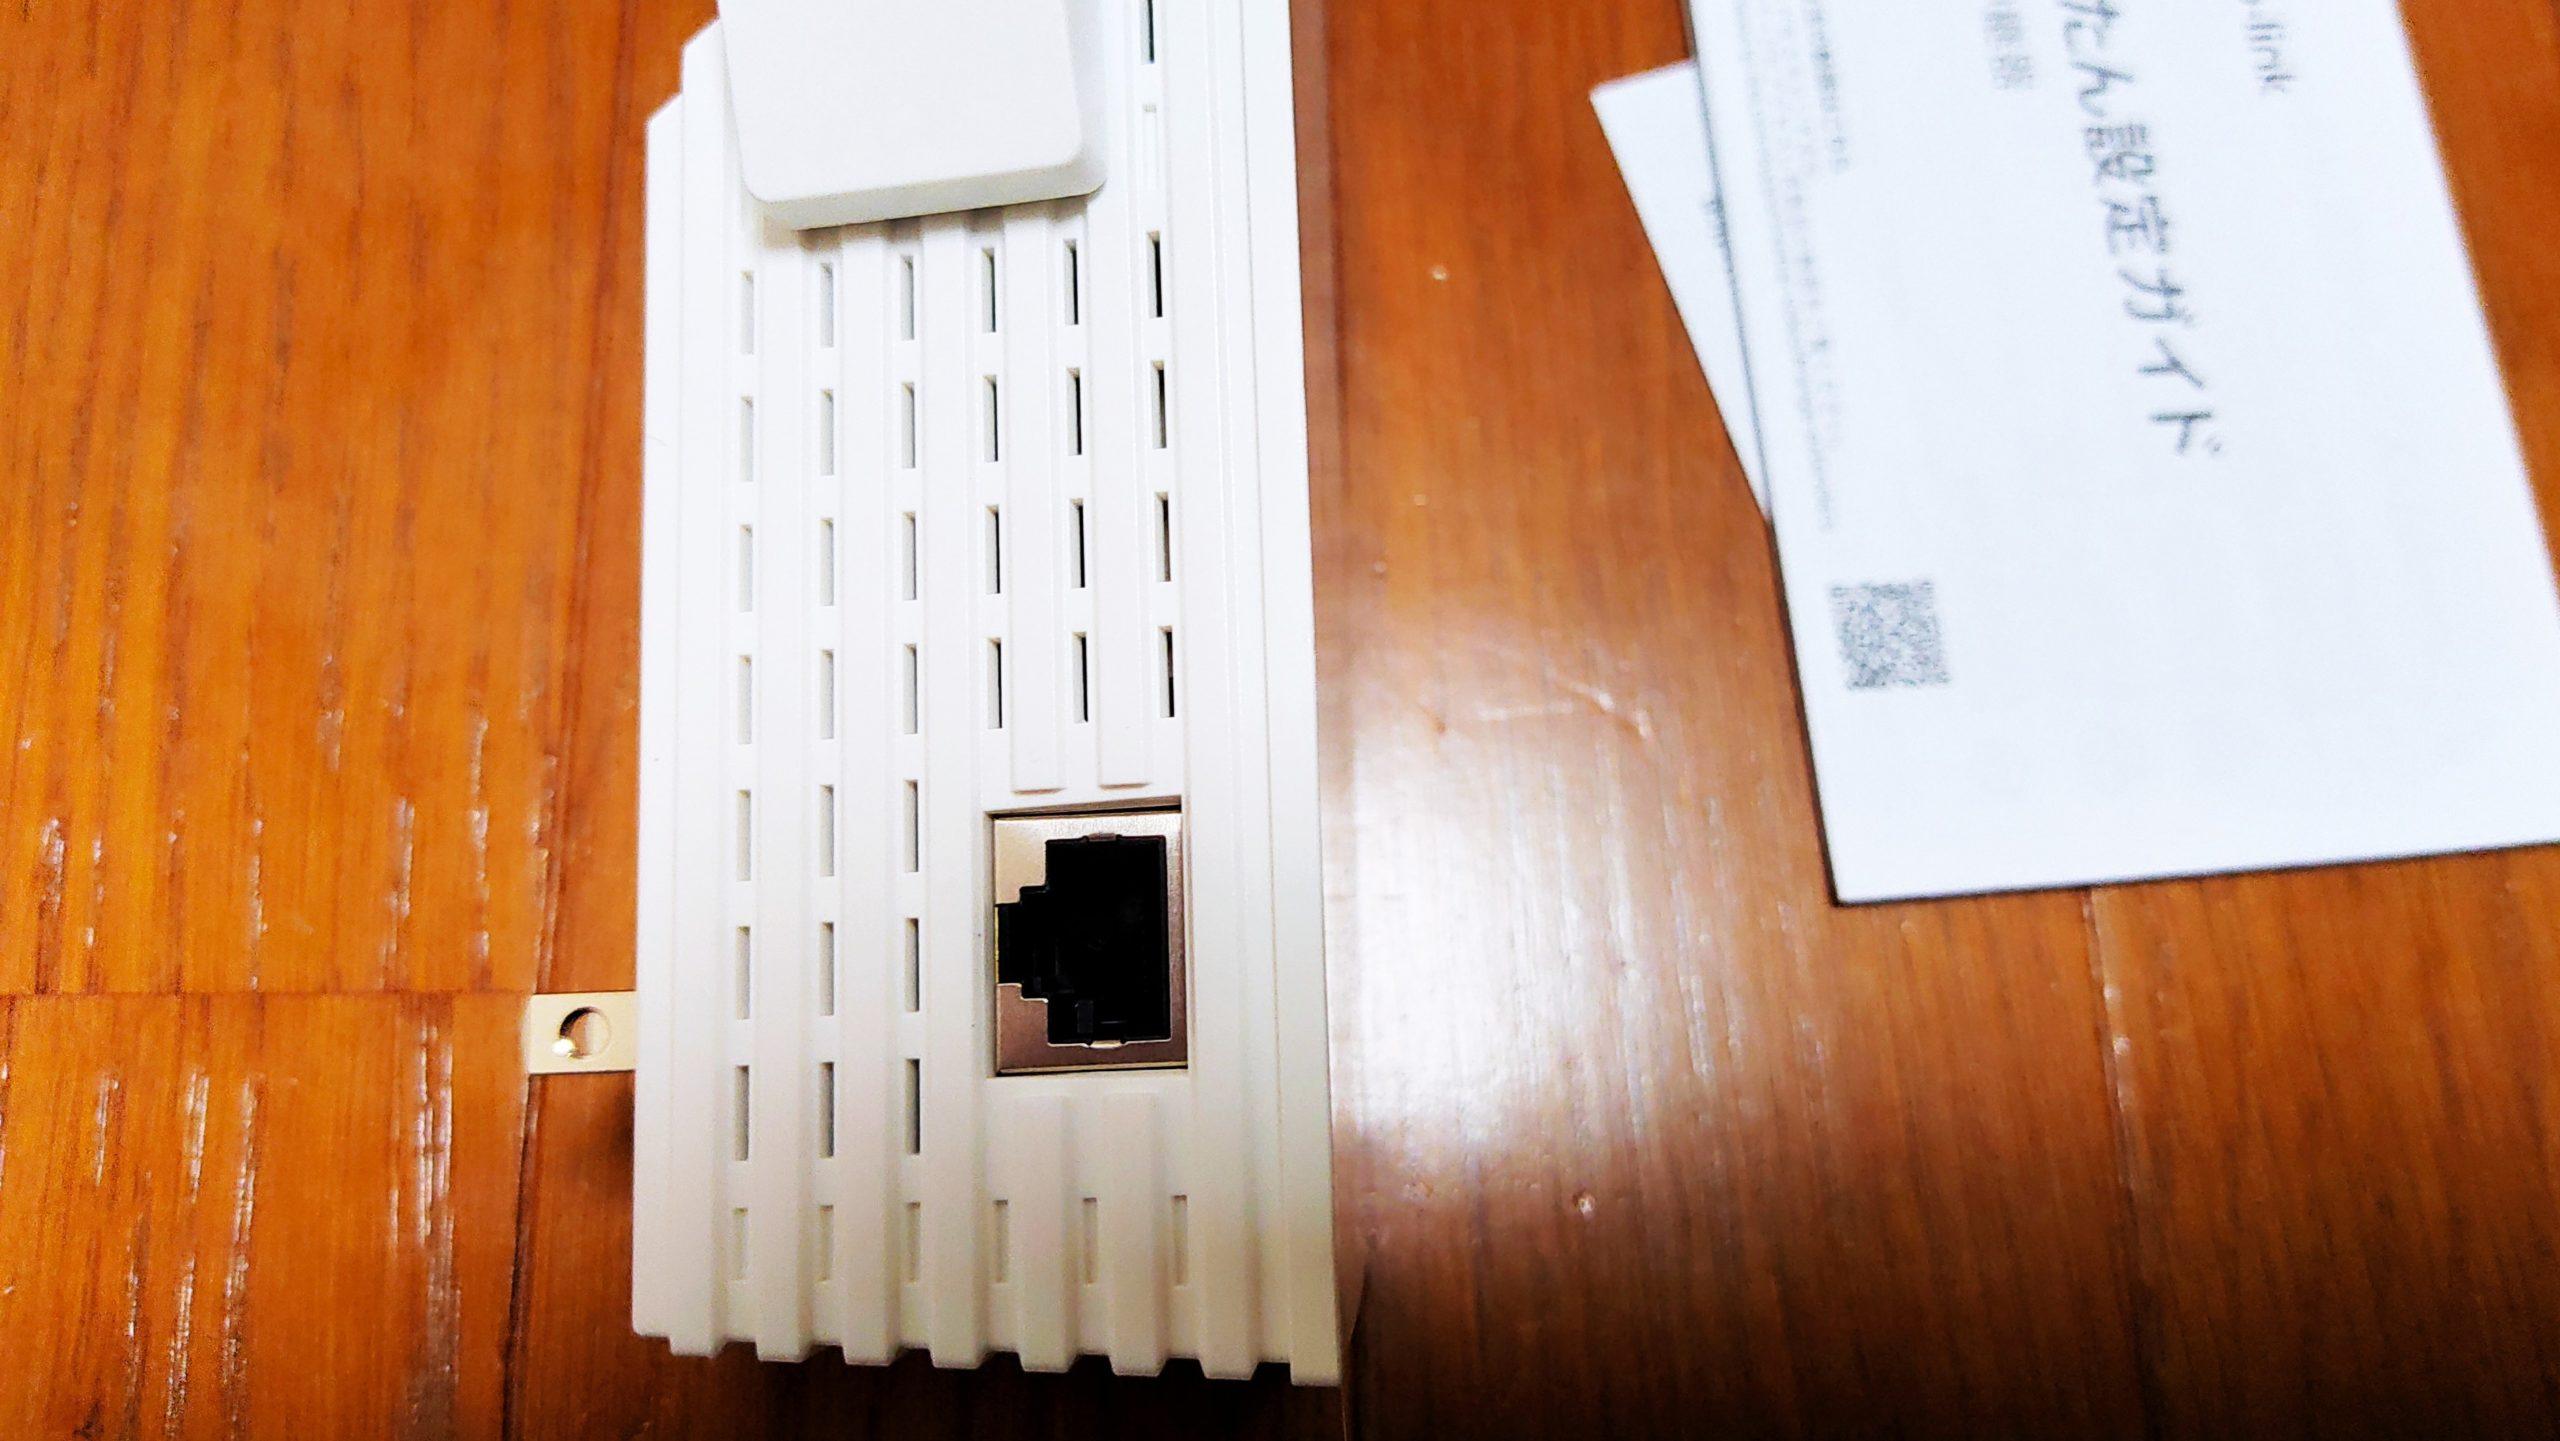 TP-Link RE605Xのギガビットイーサネットポート